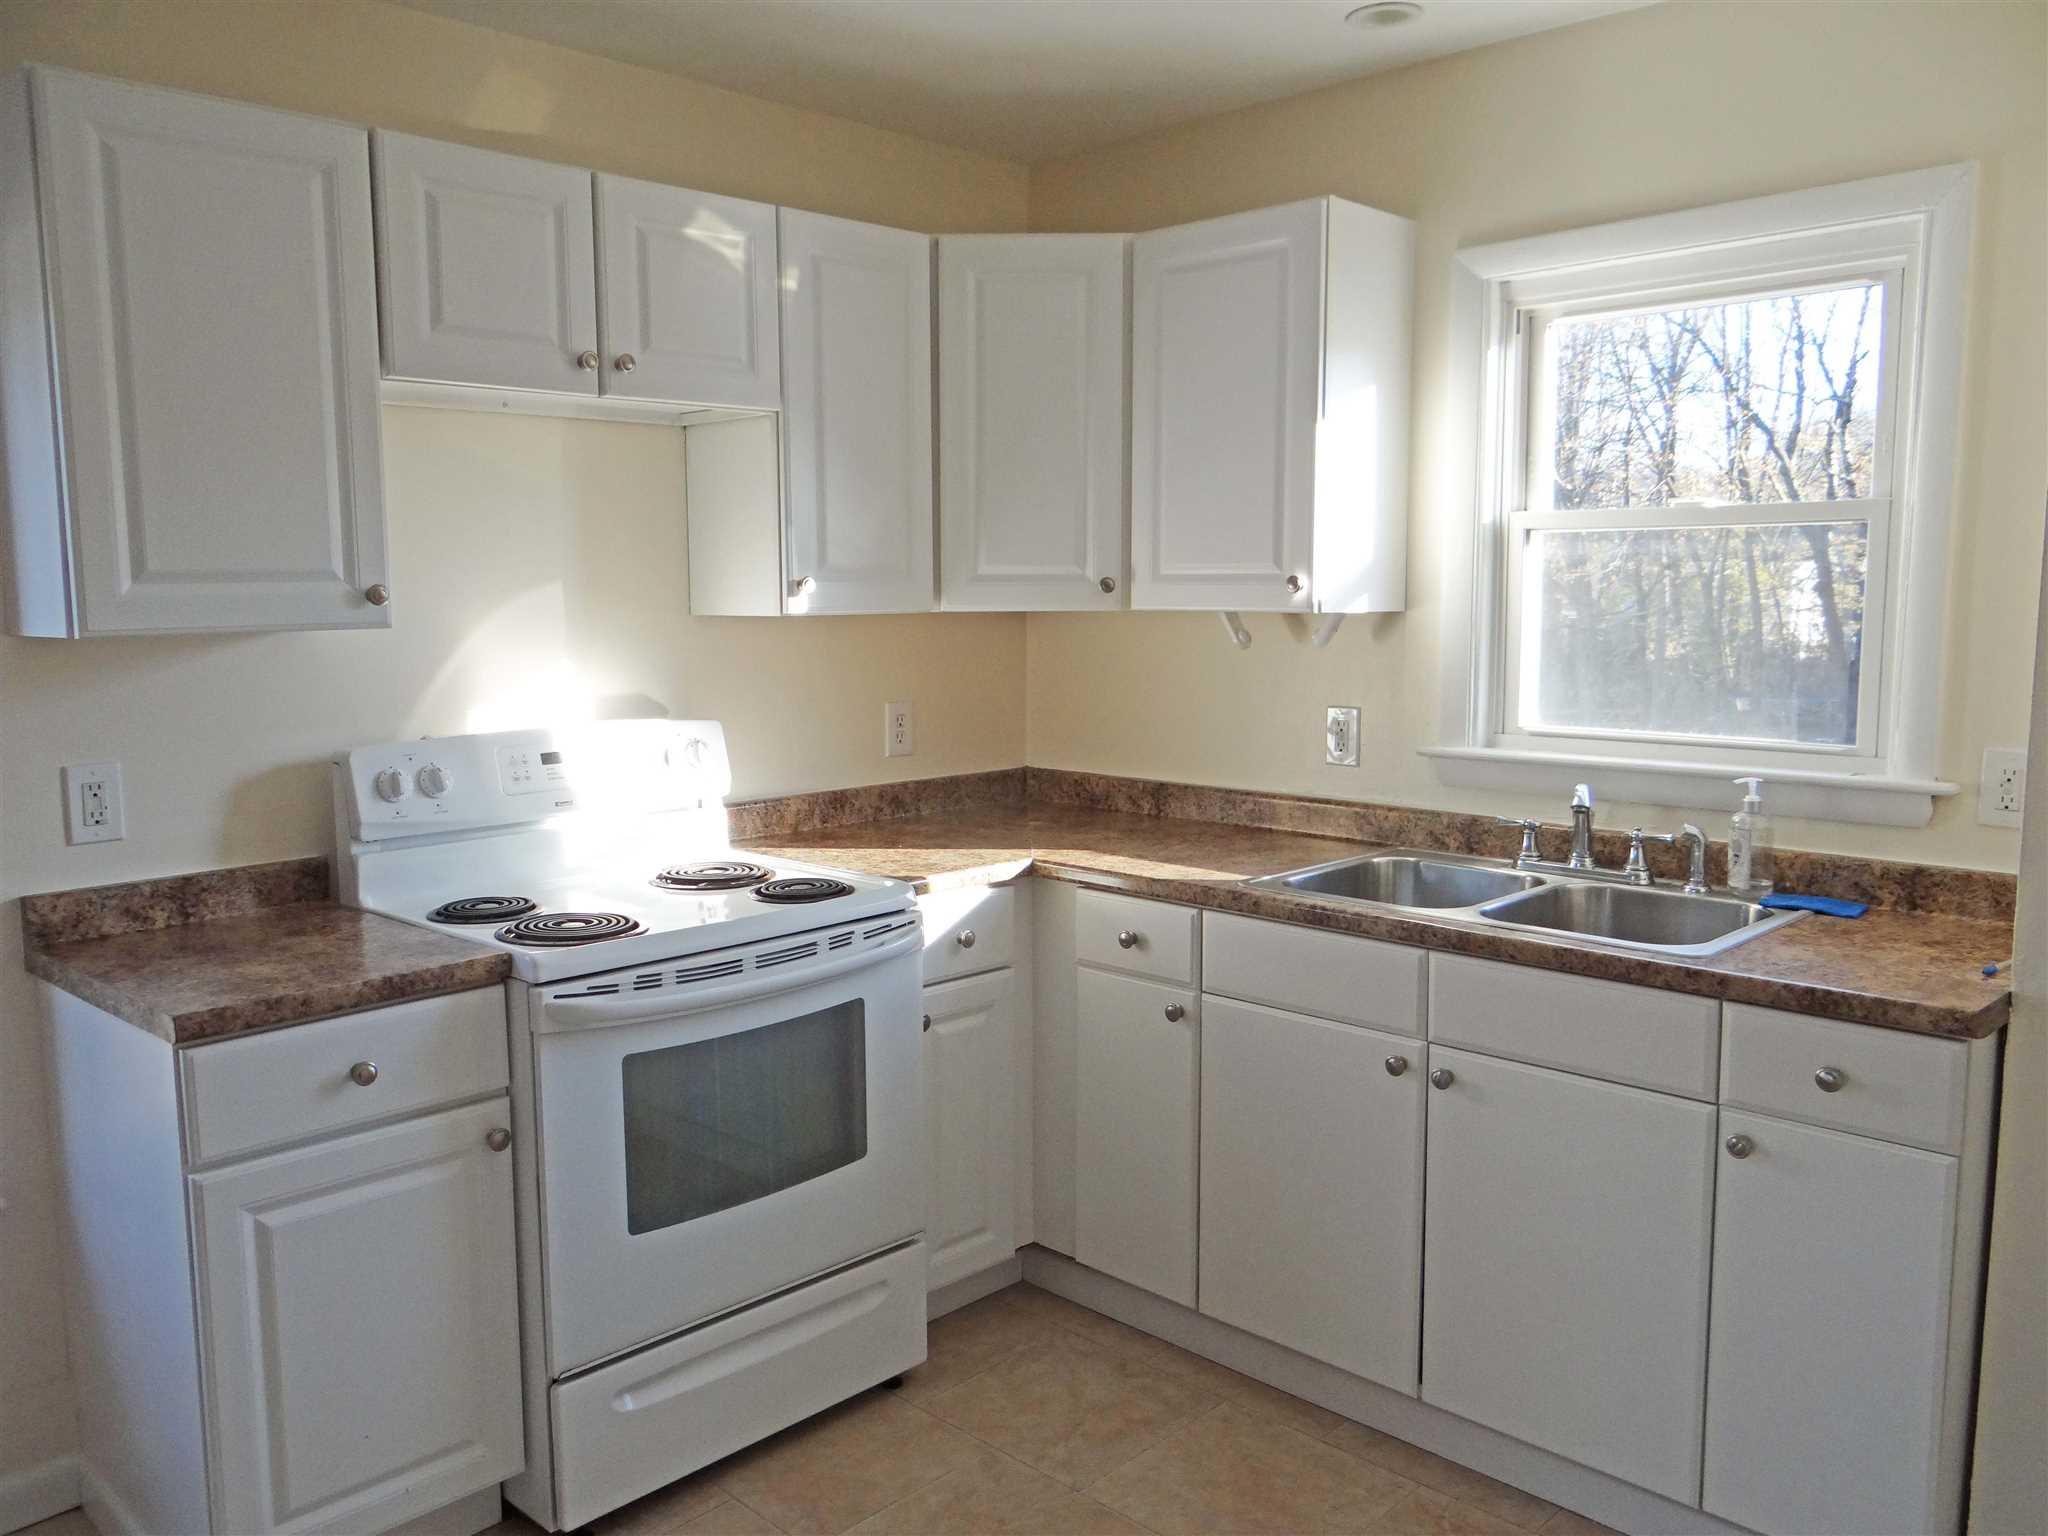 Single Family Home for Rent at 11 WASHINGTON AVENUE 11 WASHINGTON AVENUE Millbrook, New York 12545 United States